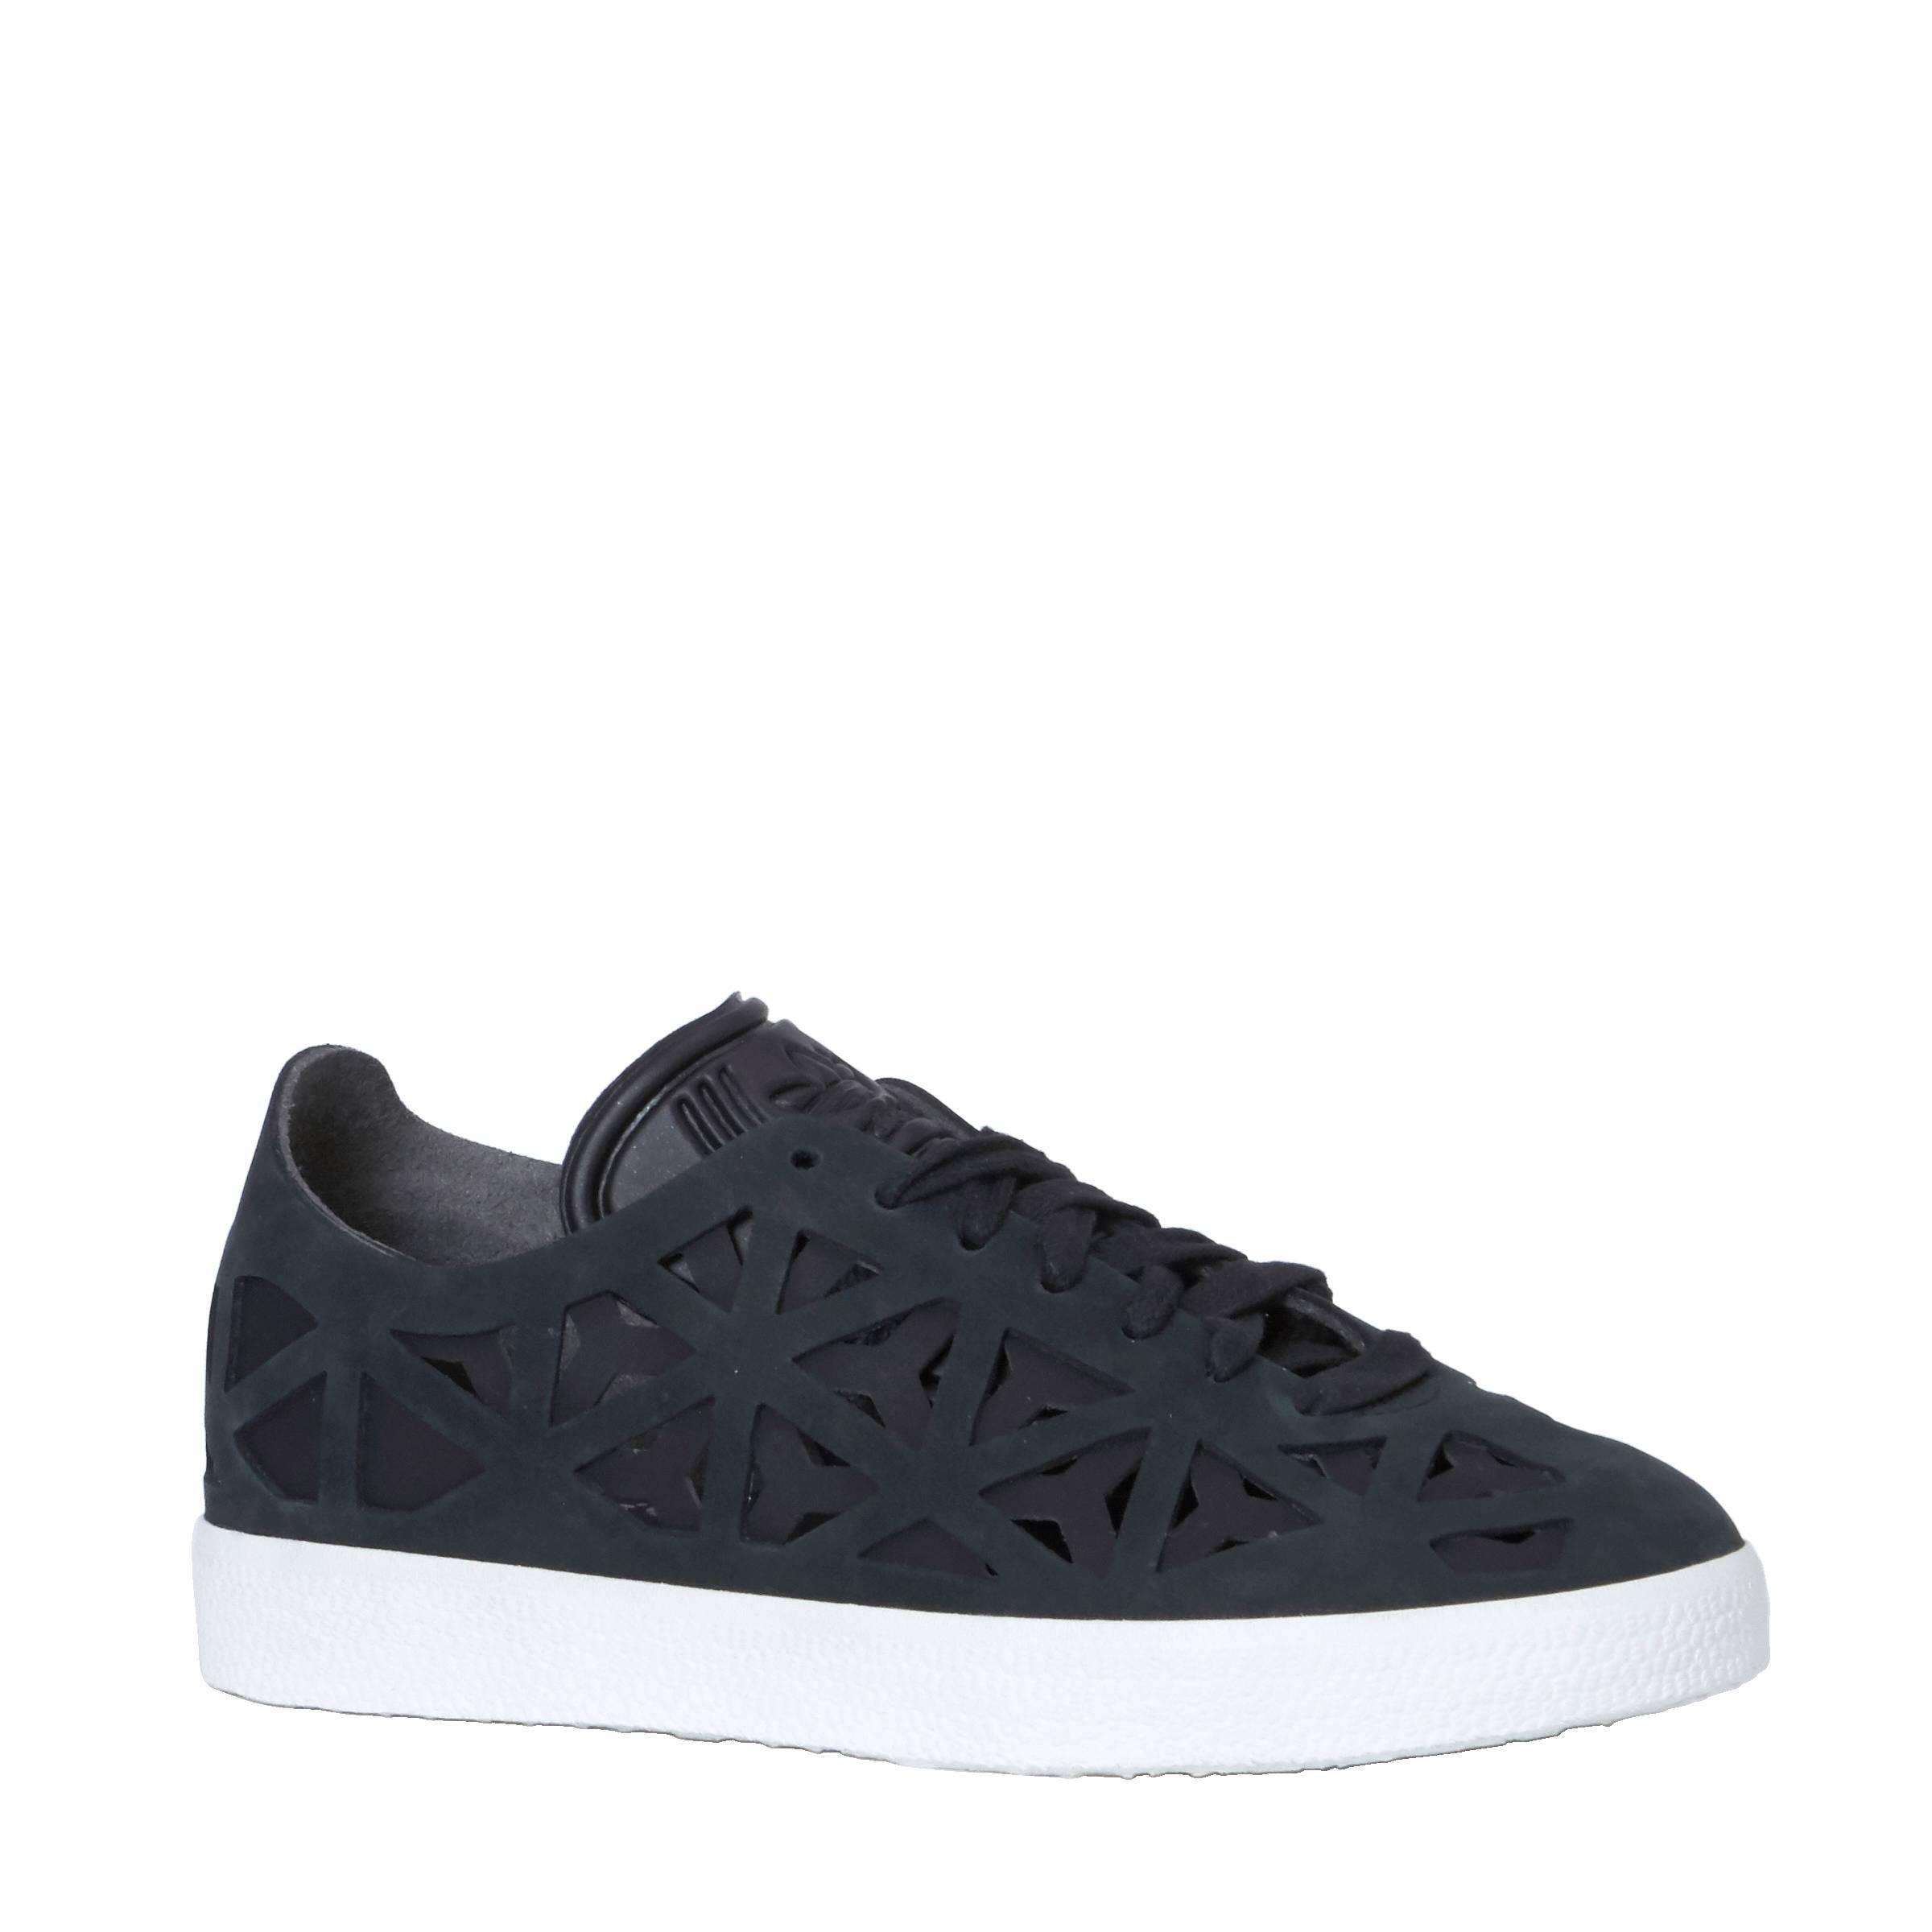 Adidas Gazelle Cutout Zwarte Sneaker